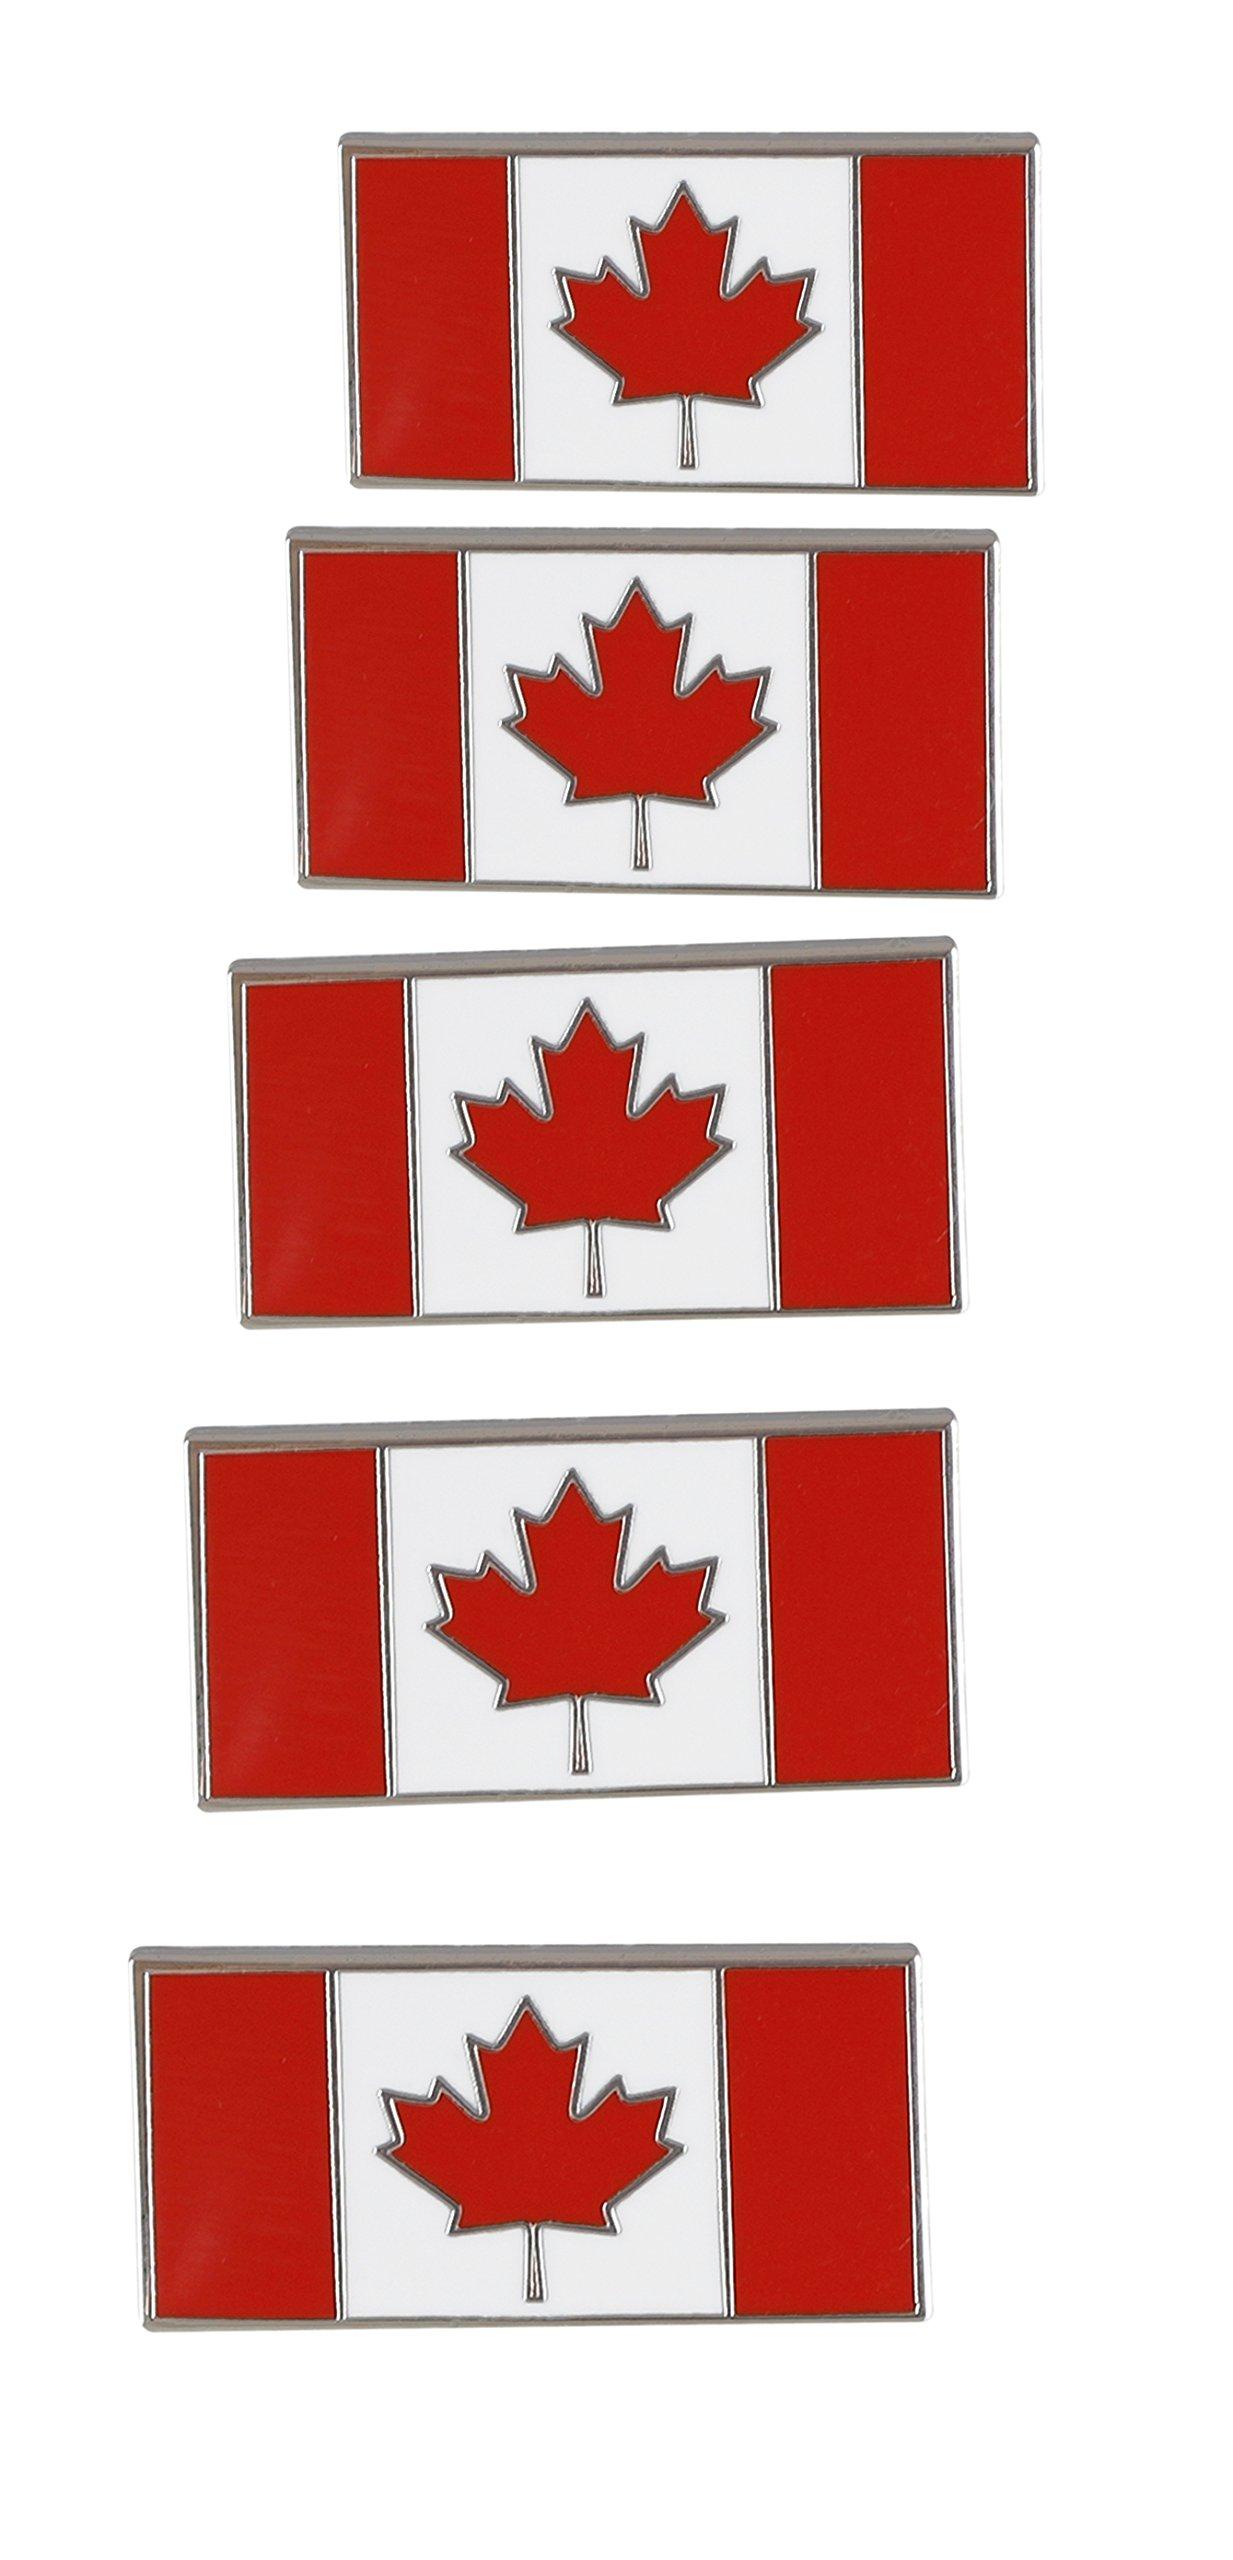 Forge Canadian Flag-Maple Leaf - Enamel Lapel Pins- Bulk (100 Pins) by Forge (Image #3)